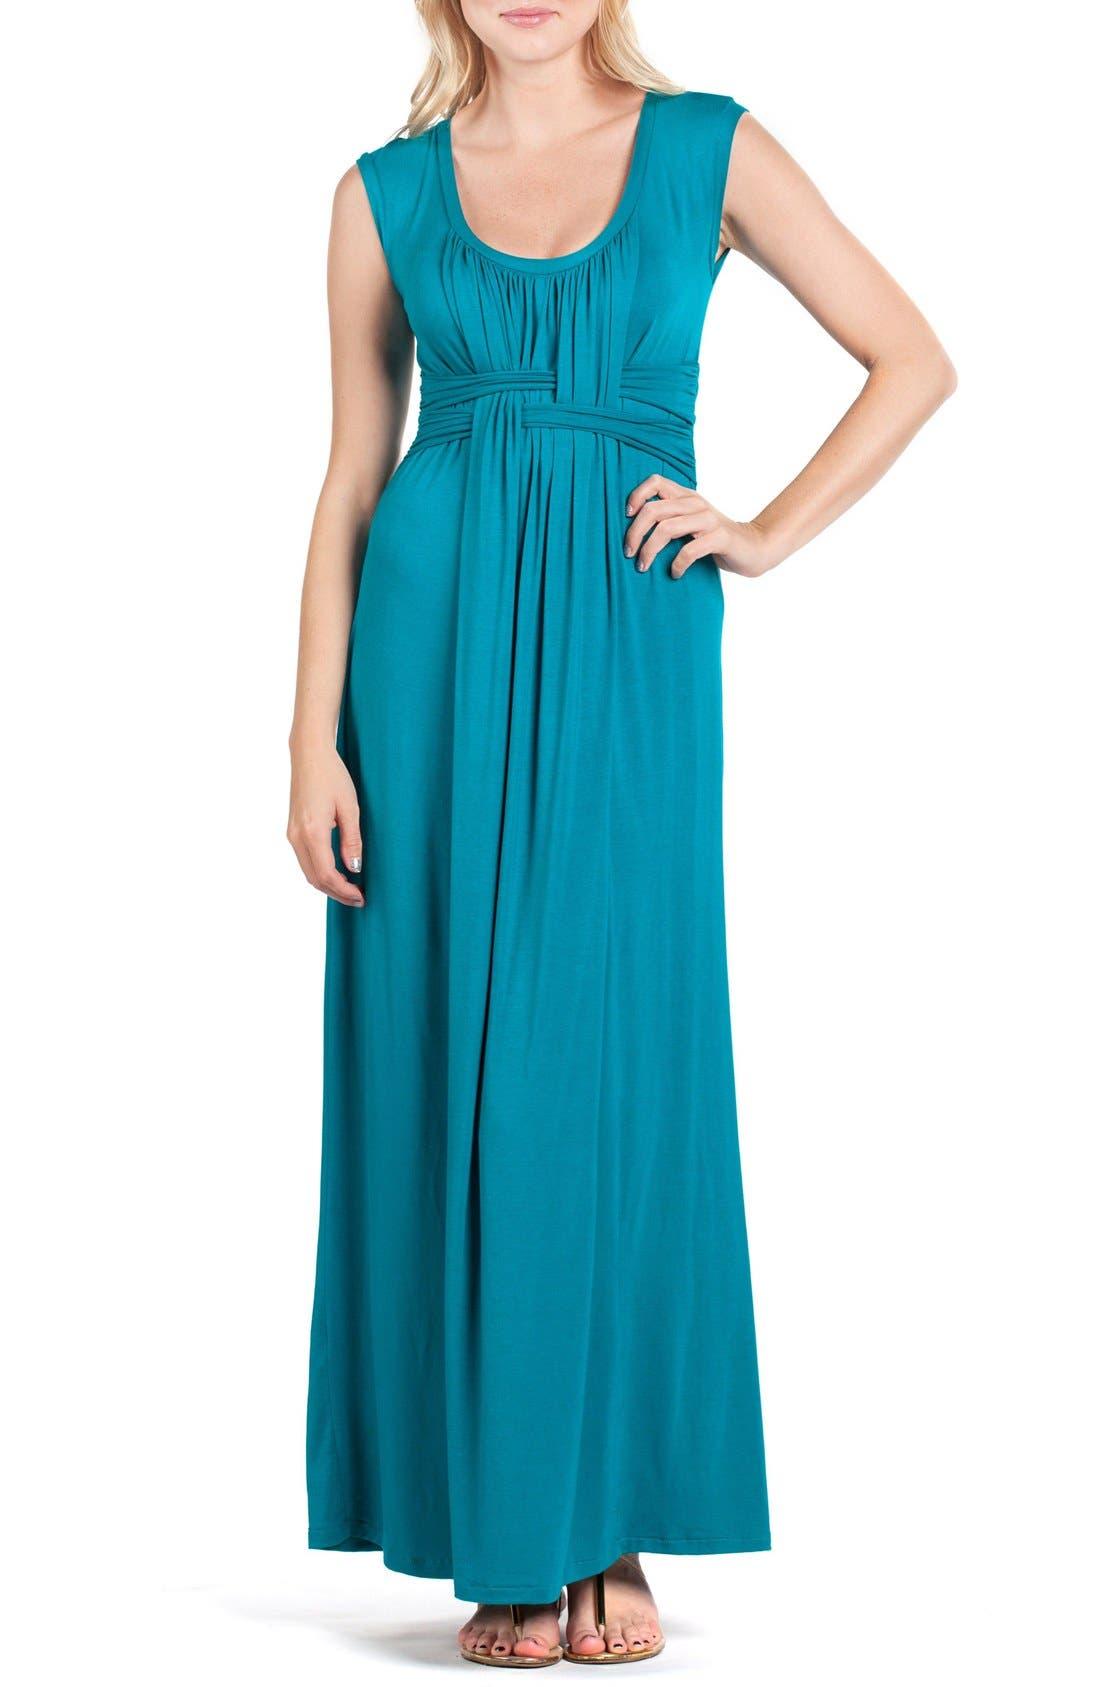 Alternate Image 1 Selected - Savi Mom Athens Maternity/Nursing Maxi Dress